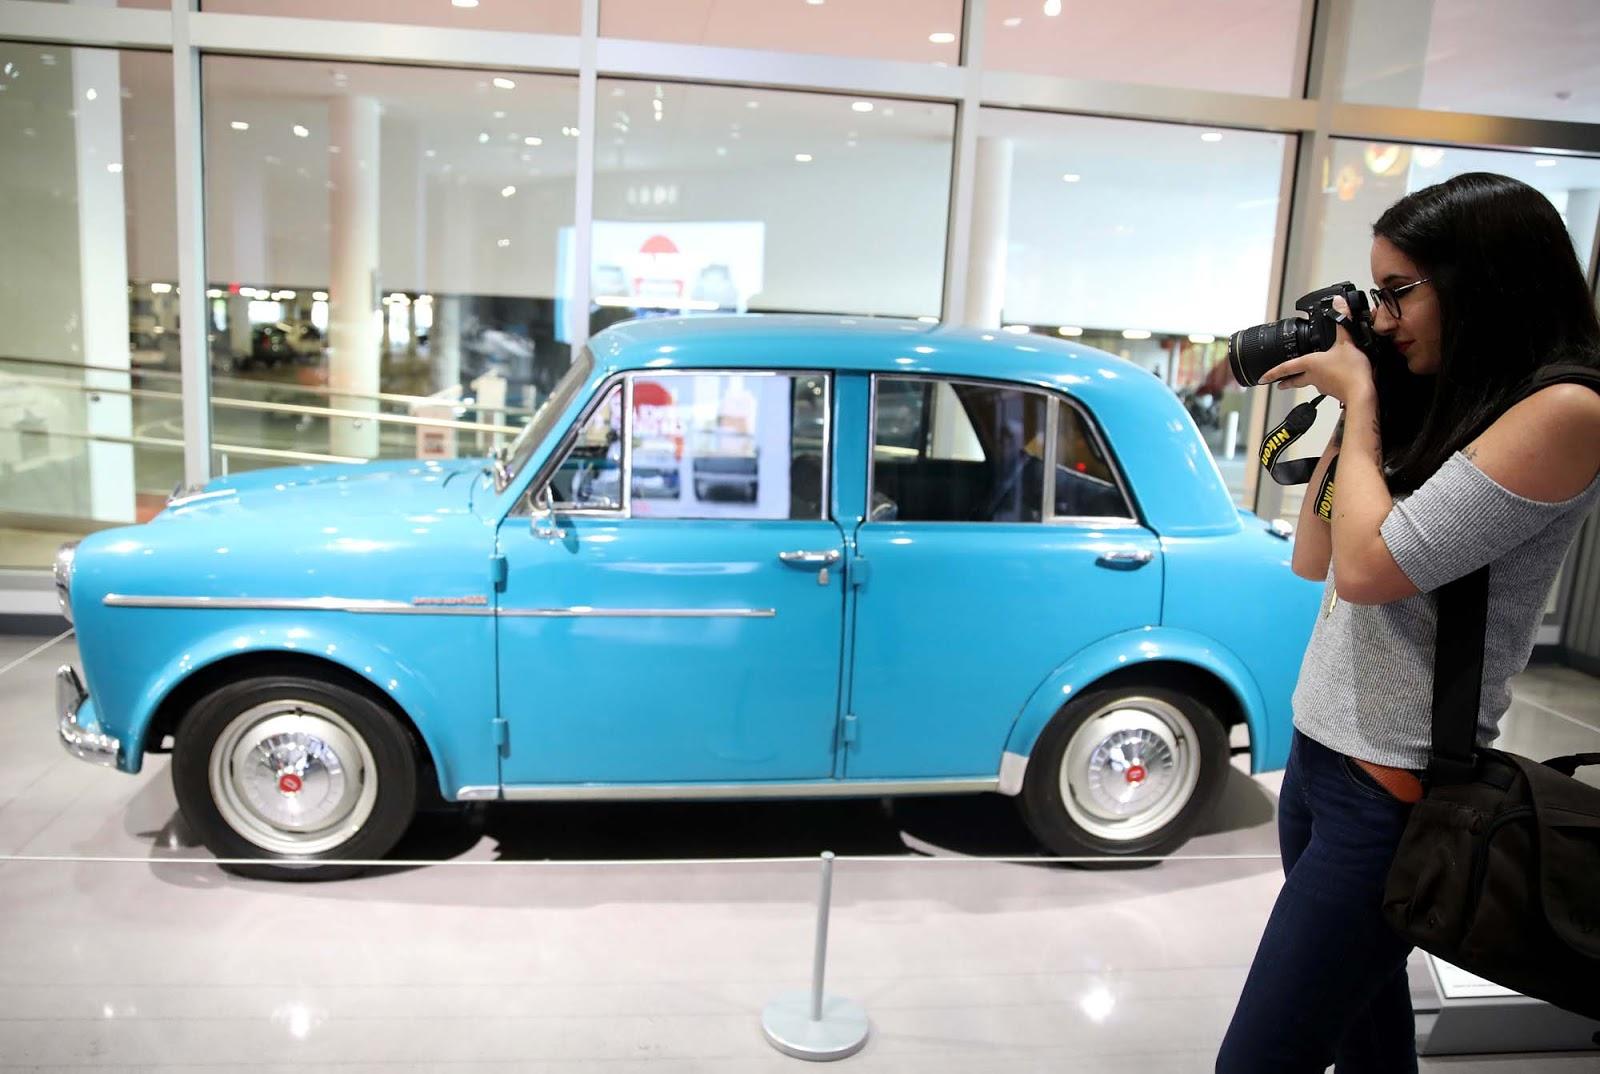 H Nissan στην έκθεση Ιαπωνικών ιστορικών αυτοκινήτων, στο Μουσείο Αυτοκινήτου του Petersen (photos)